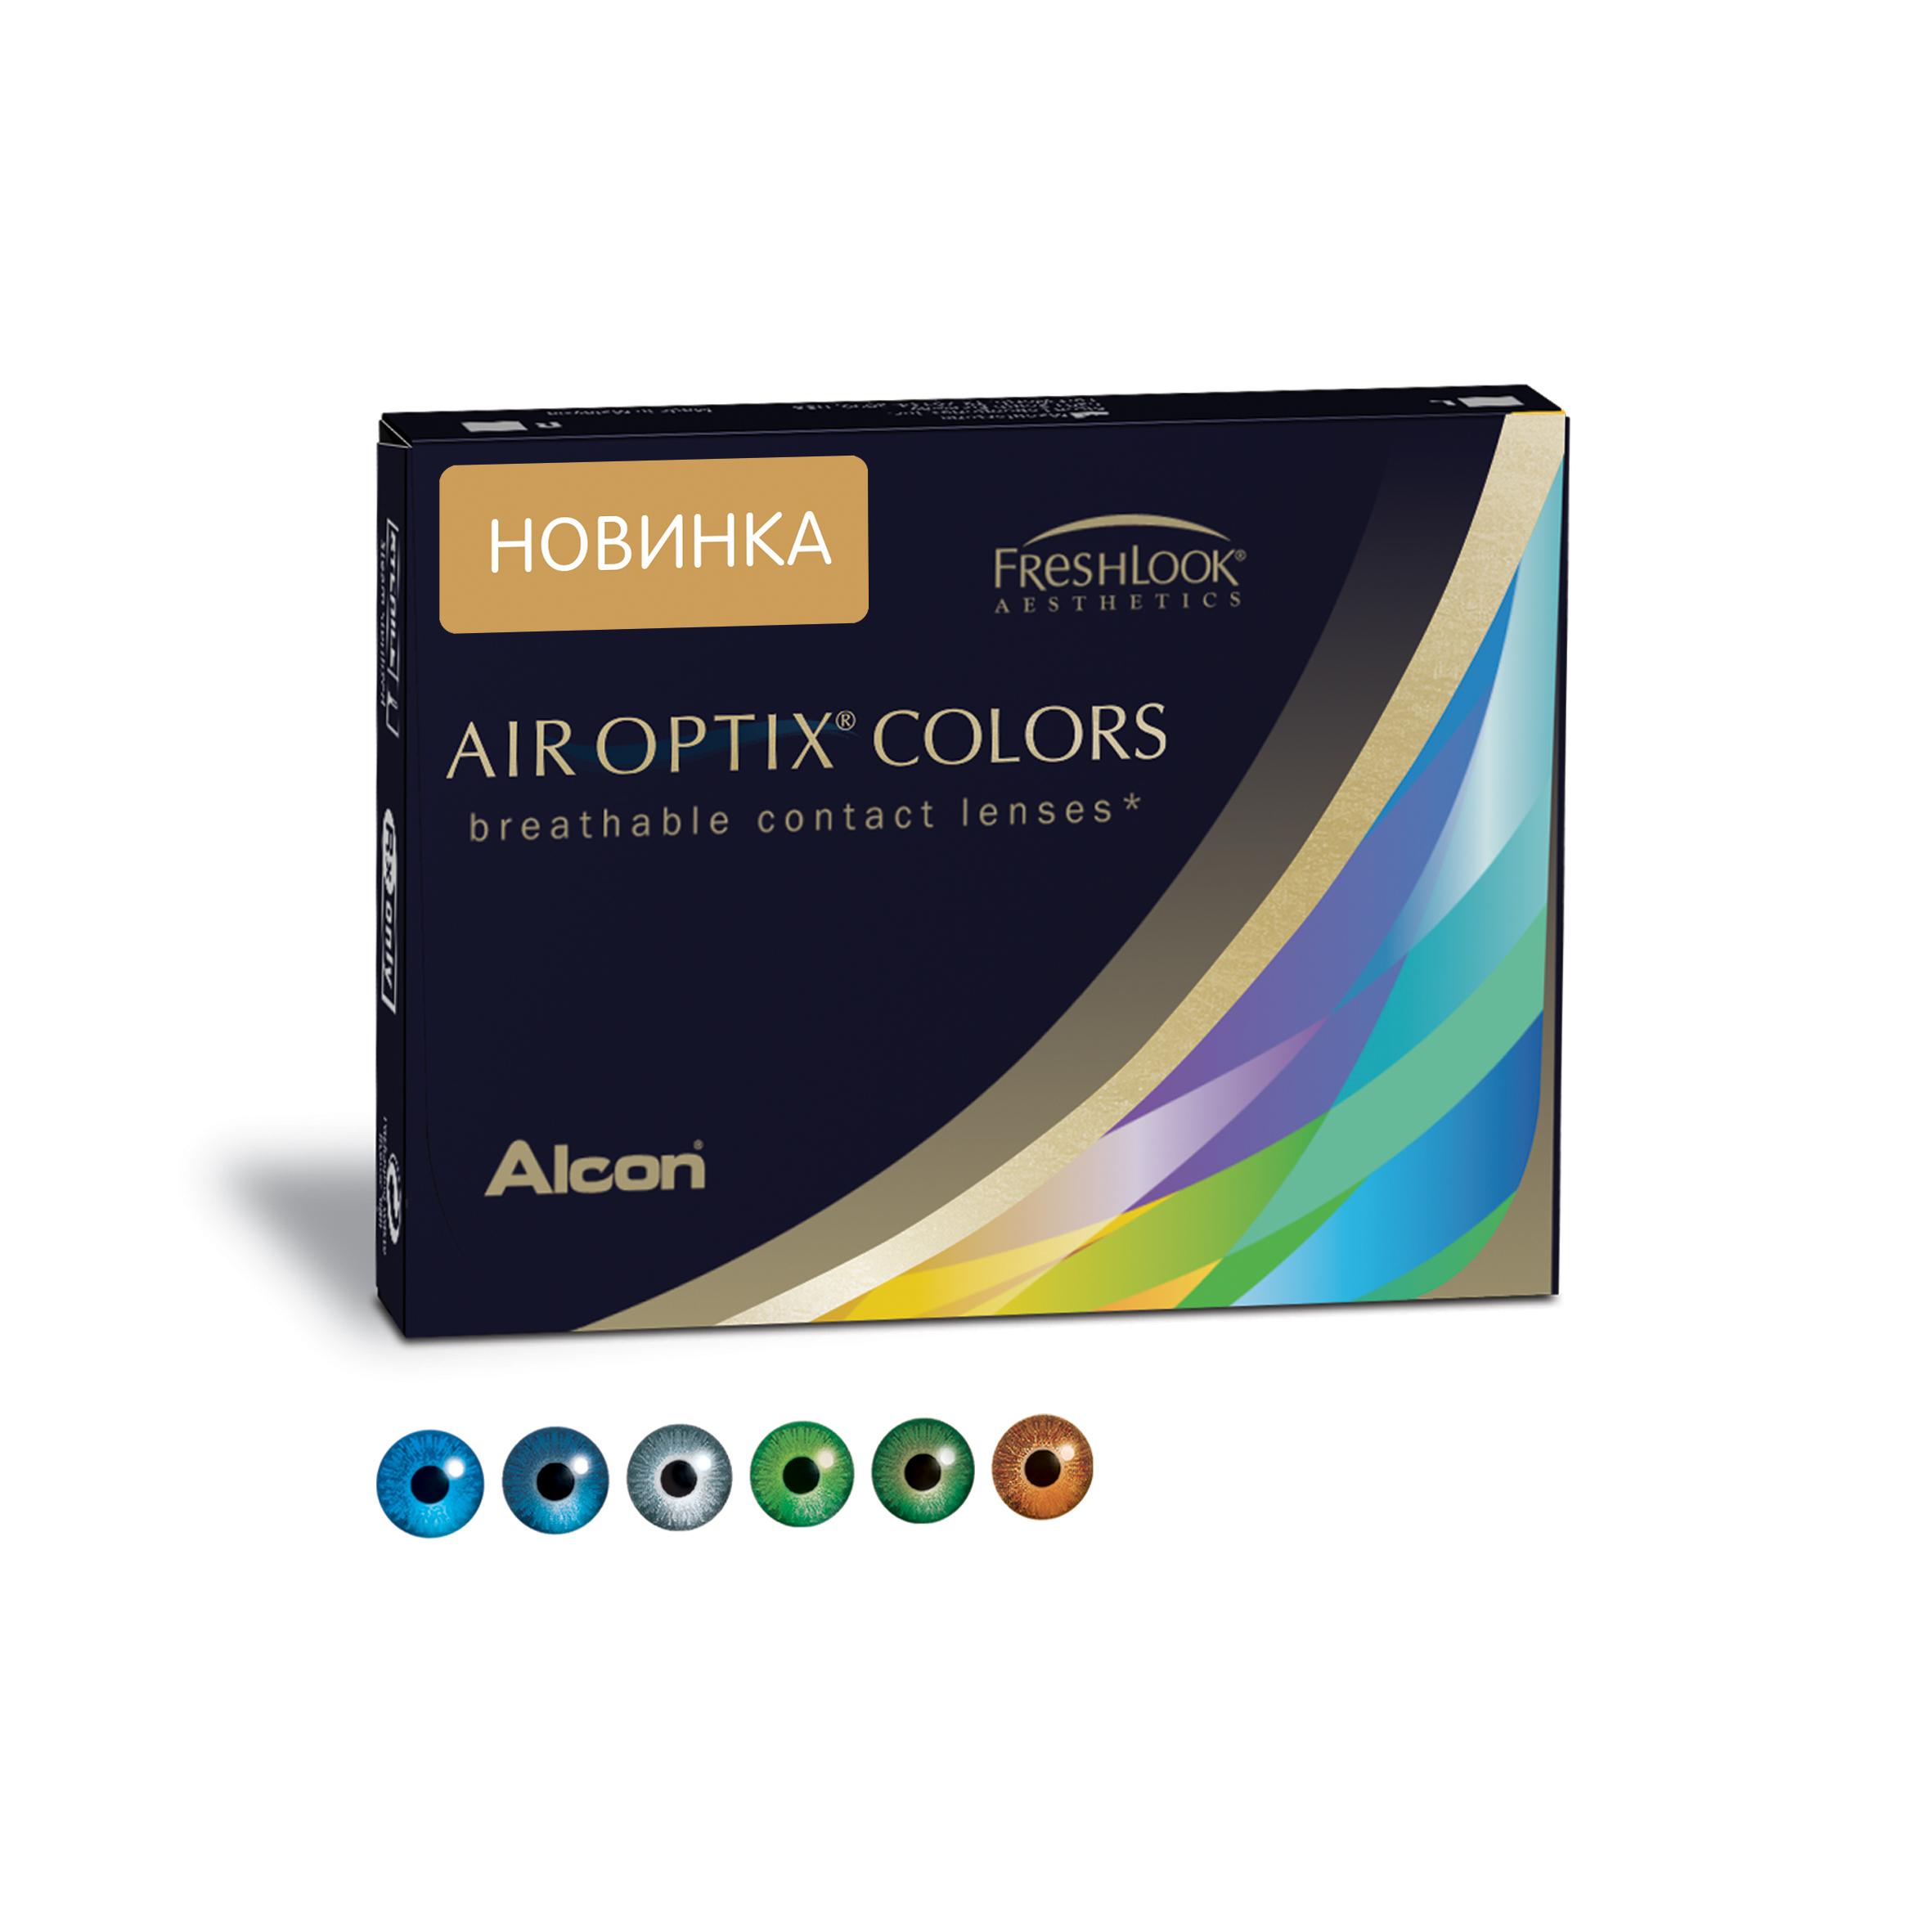 Аlcon контактные линзы Air Optix Colors 2 шт -0.00 Gemstone Green31746088Мягкие контактные линзы